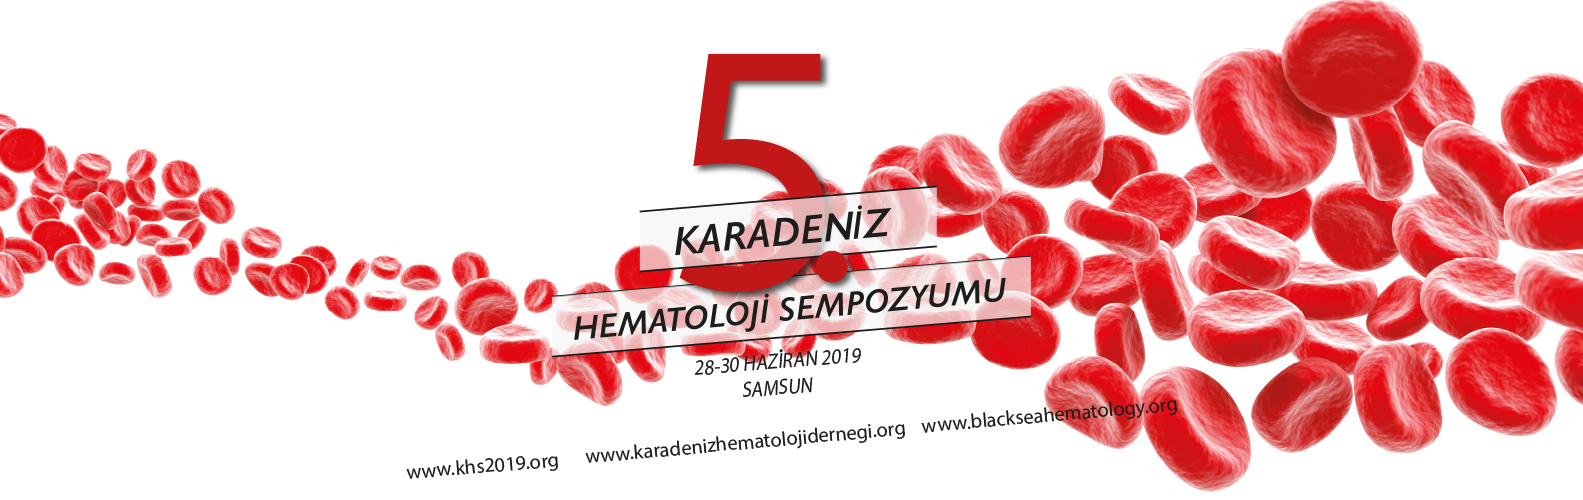 5. Karadeniz Hematoloji Sempozyumu